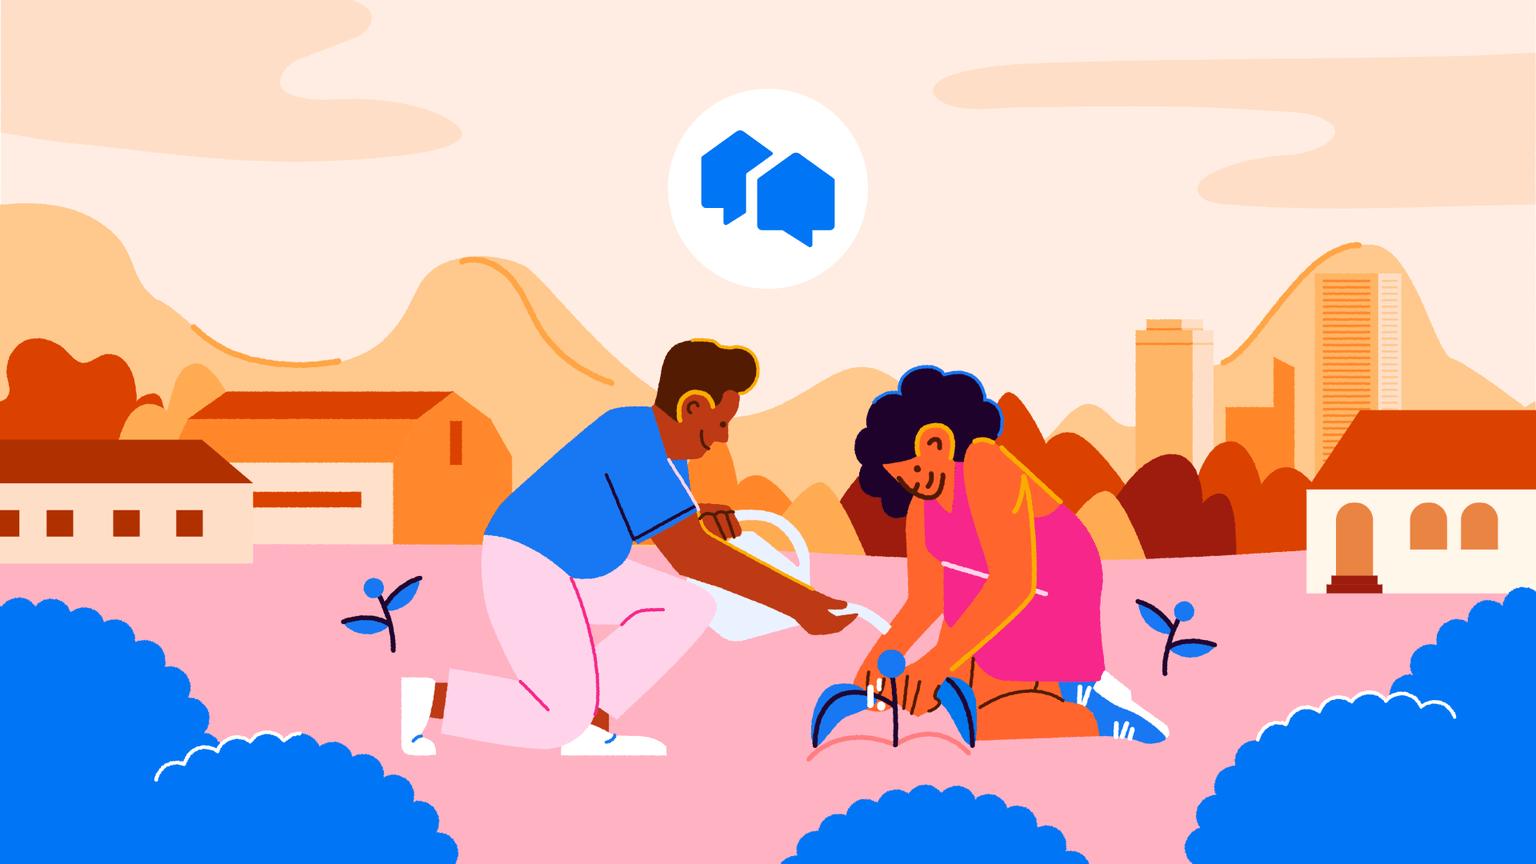 Facebook's new Neighborhoods feature takes aim at the Nextdoor app - TalkAndroid.com